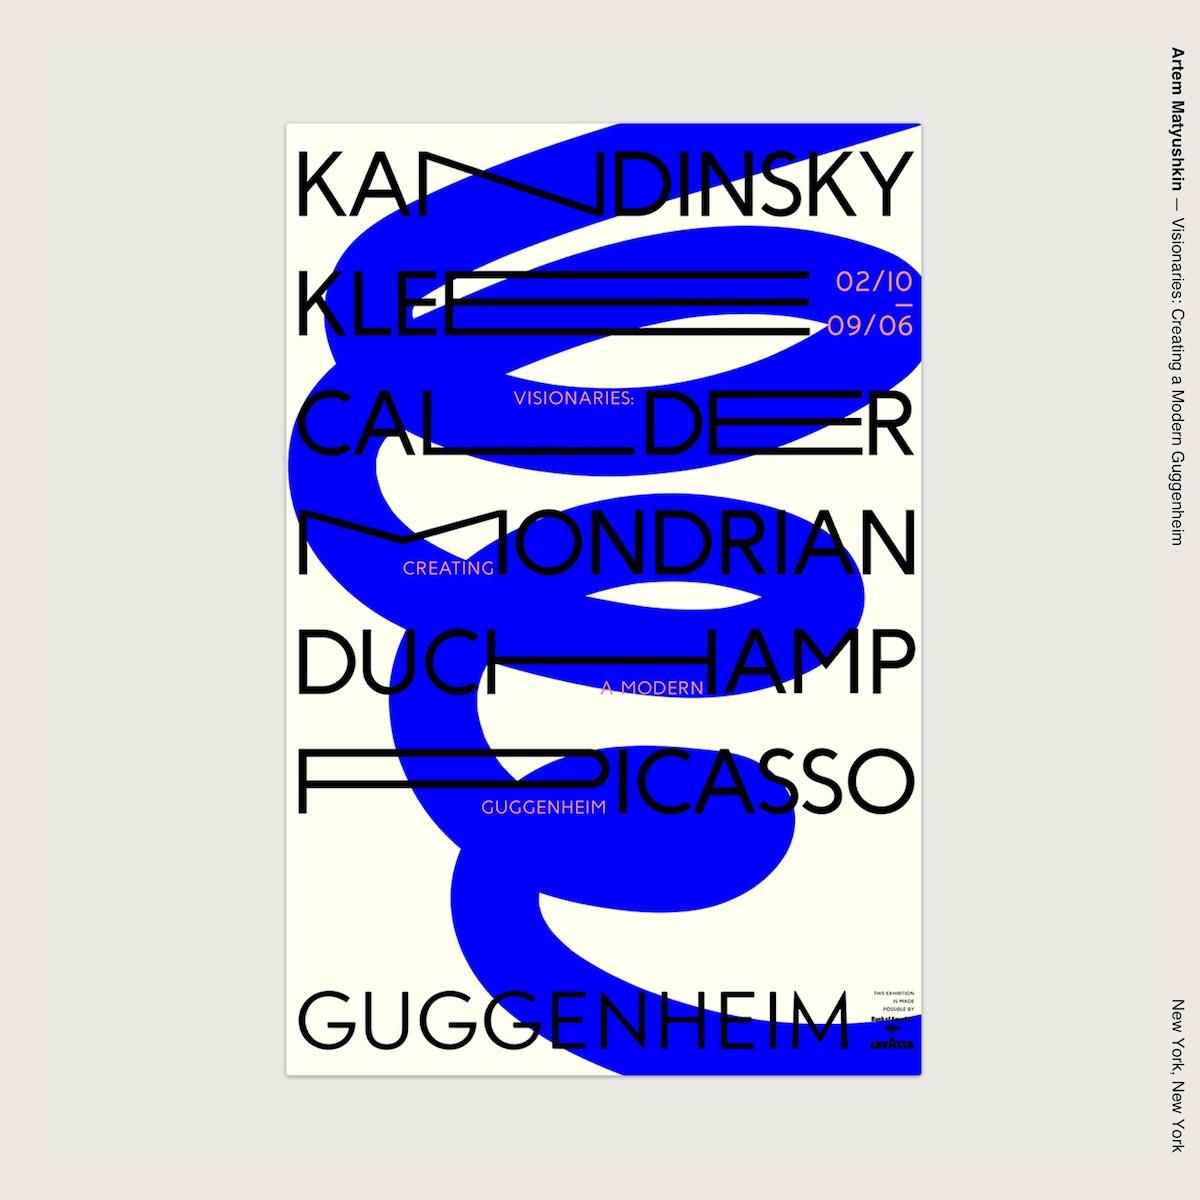 Artem Matyushkin — Visionaries: Creating a Modern Guggenheim